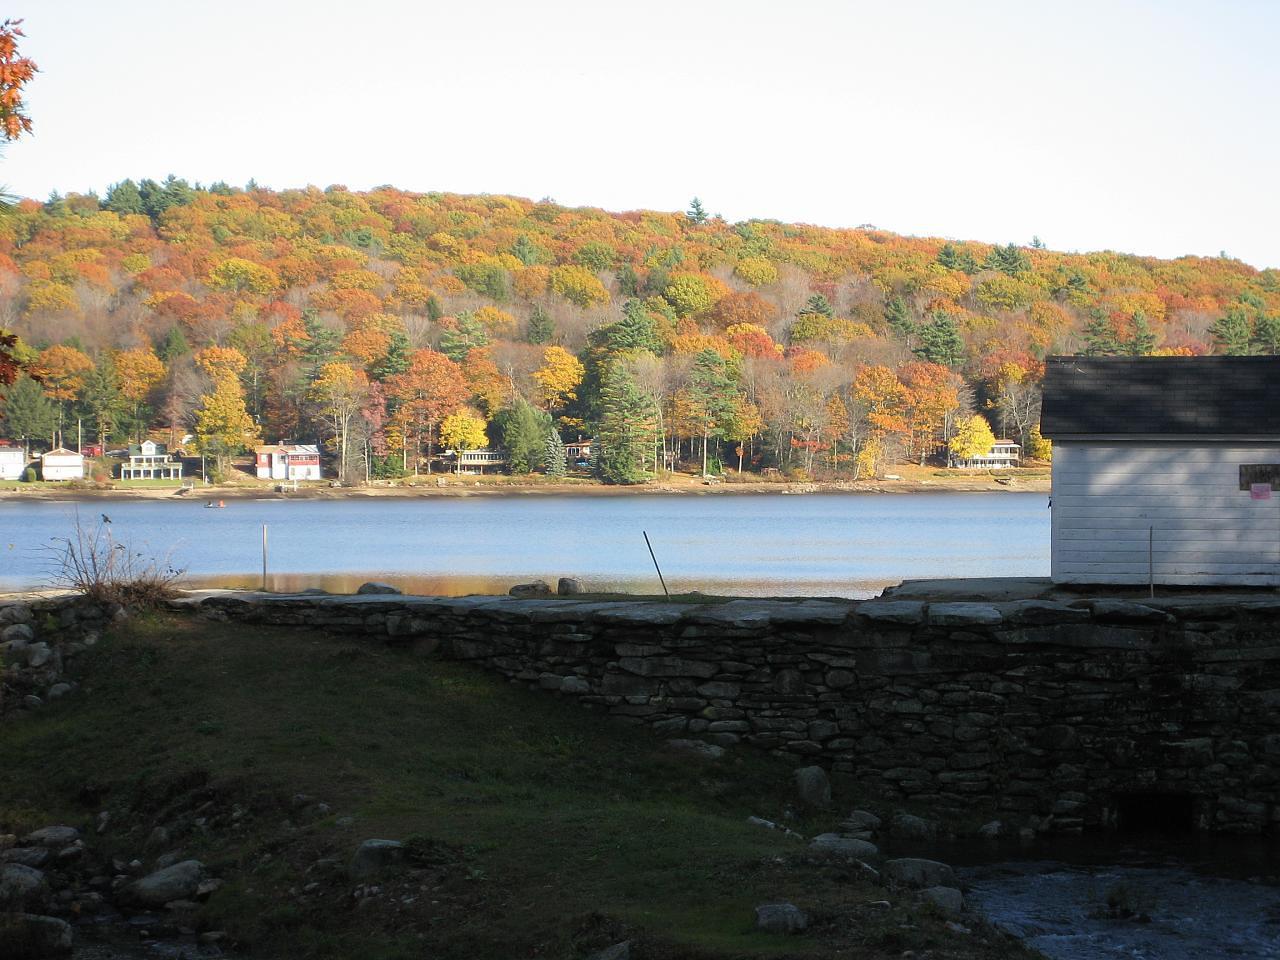 Lake Wyola and the dam